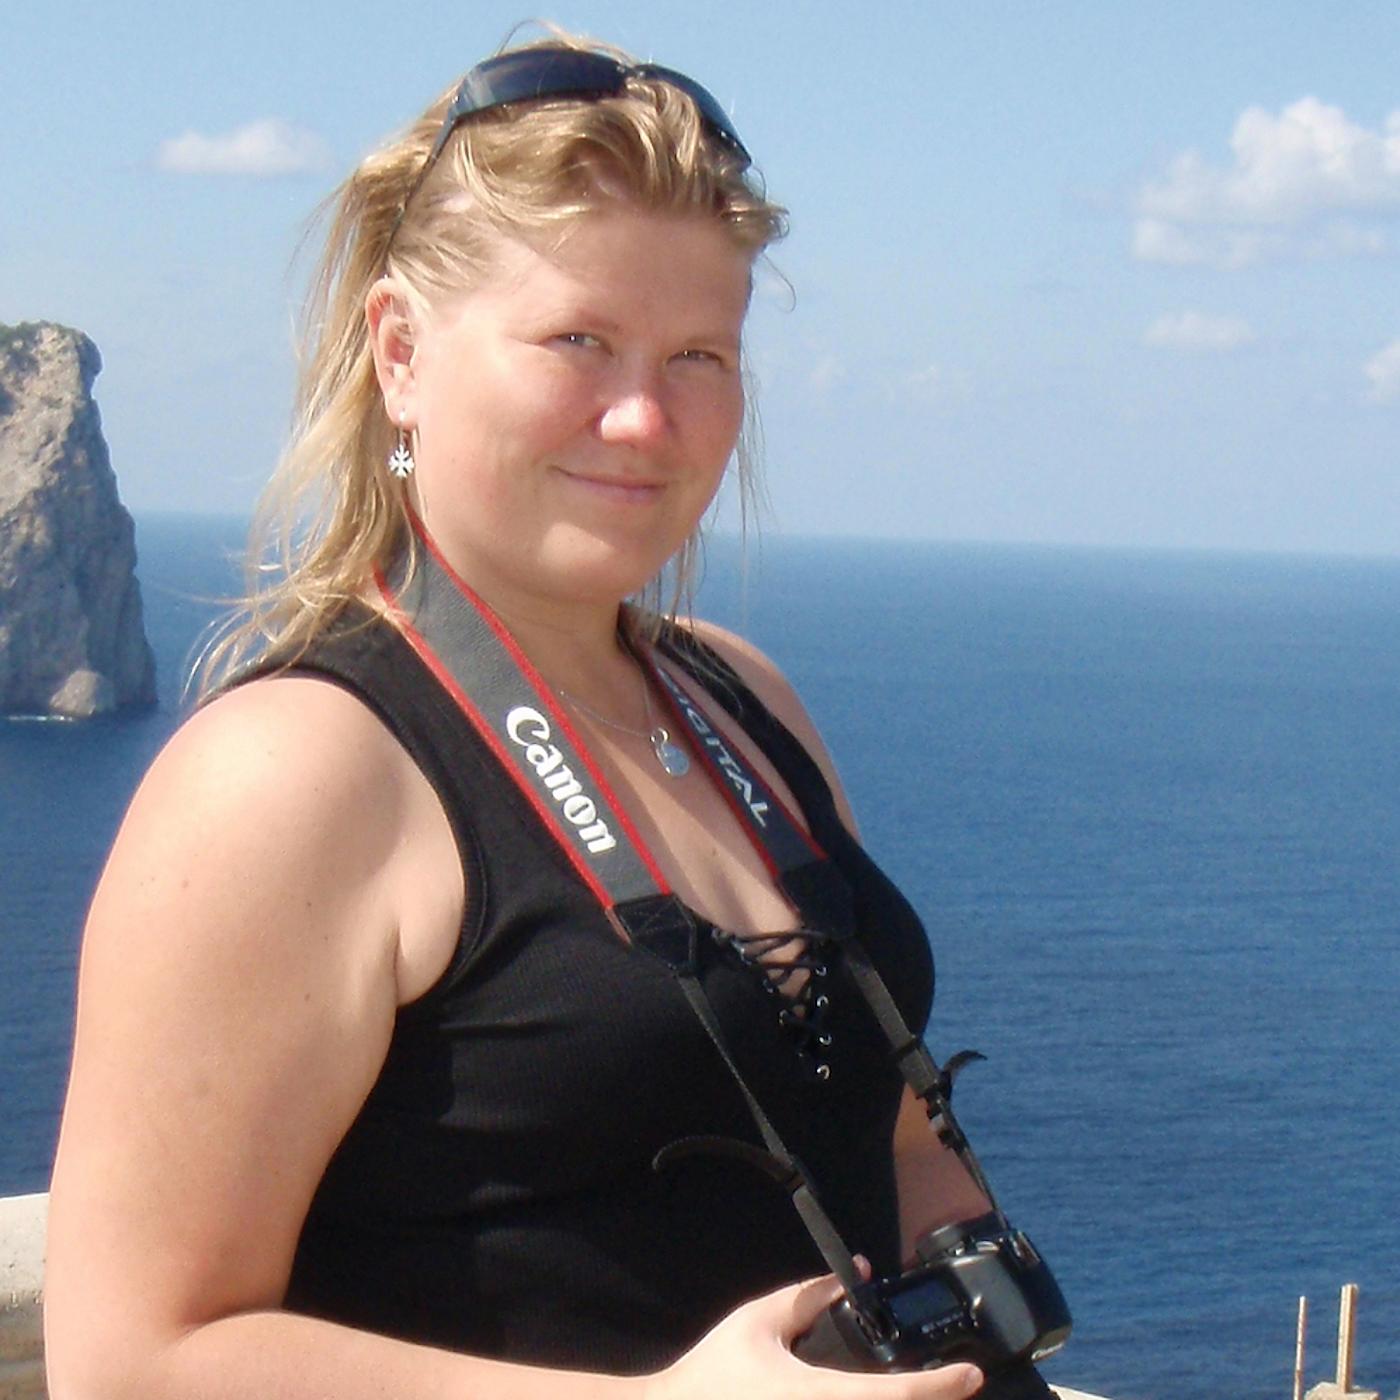 Fallet Marina Johansson